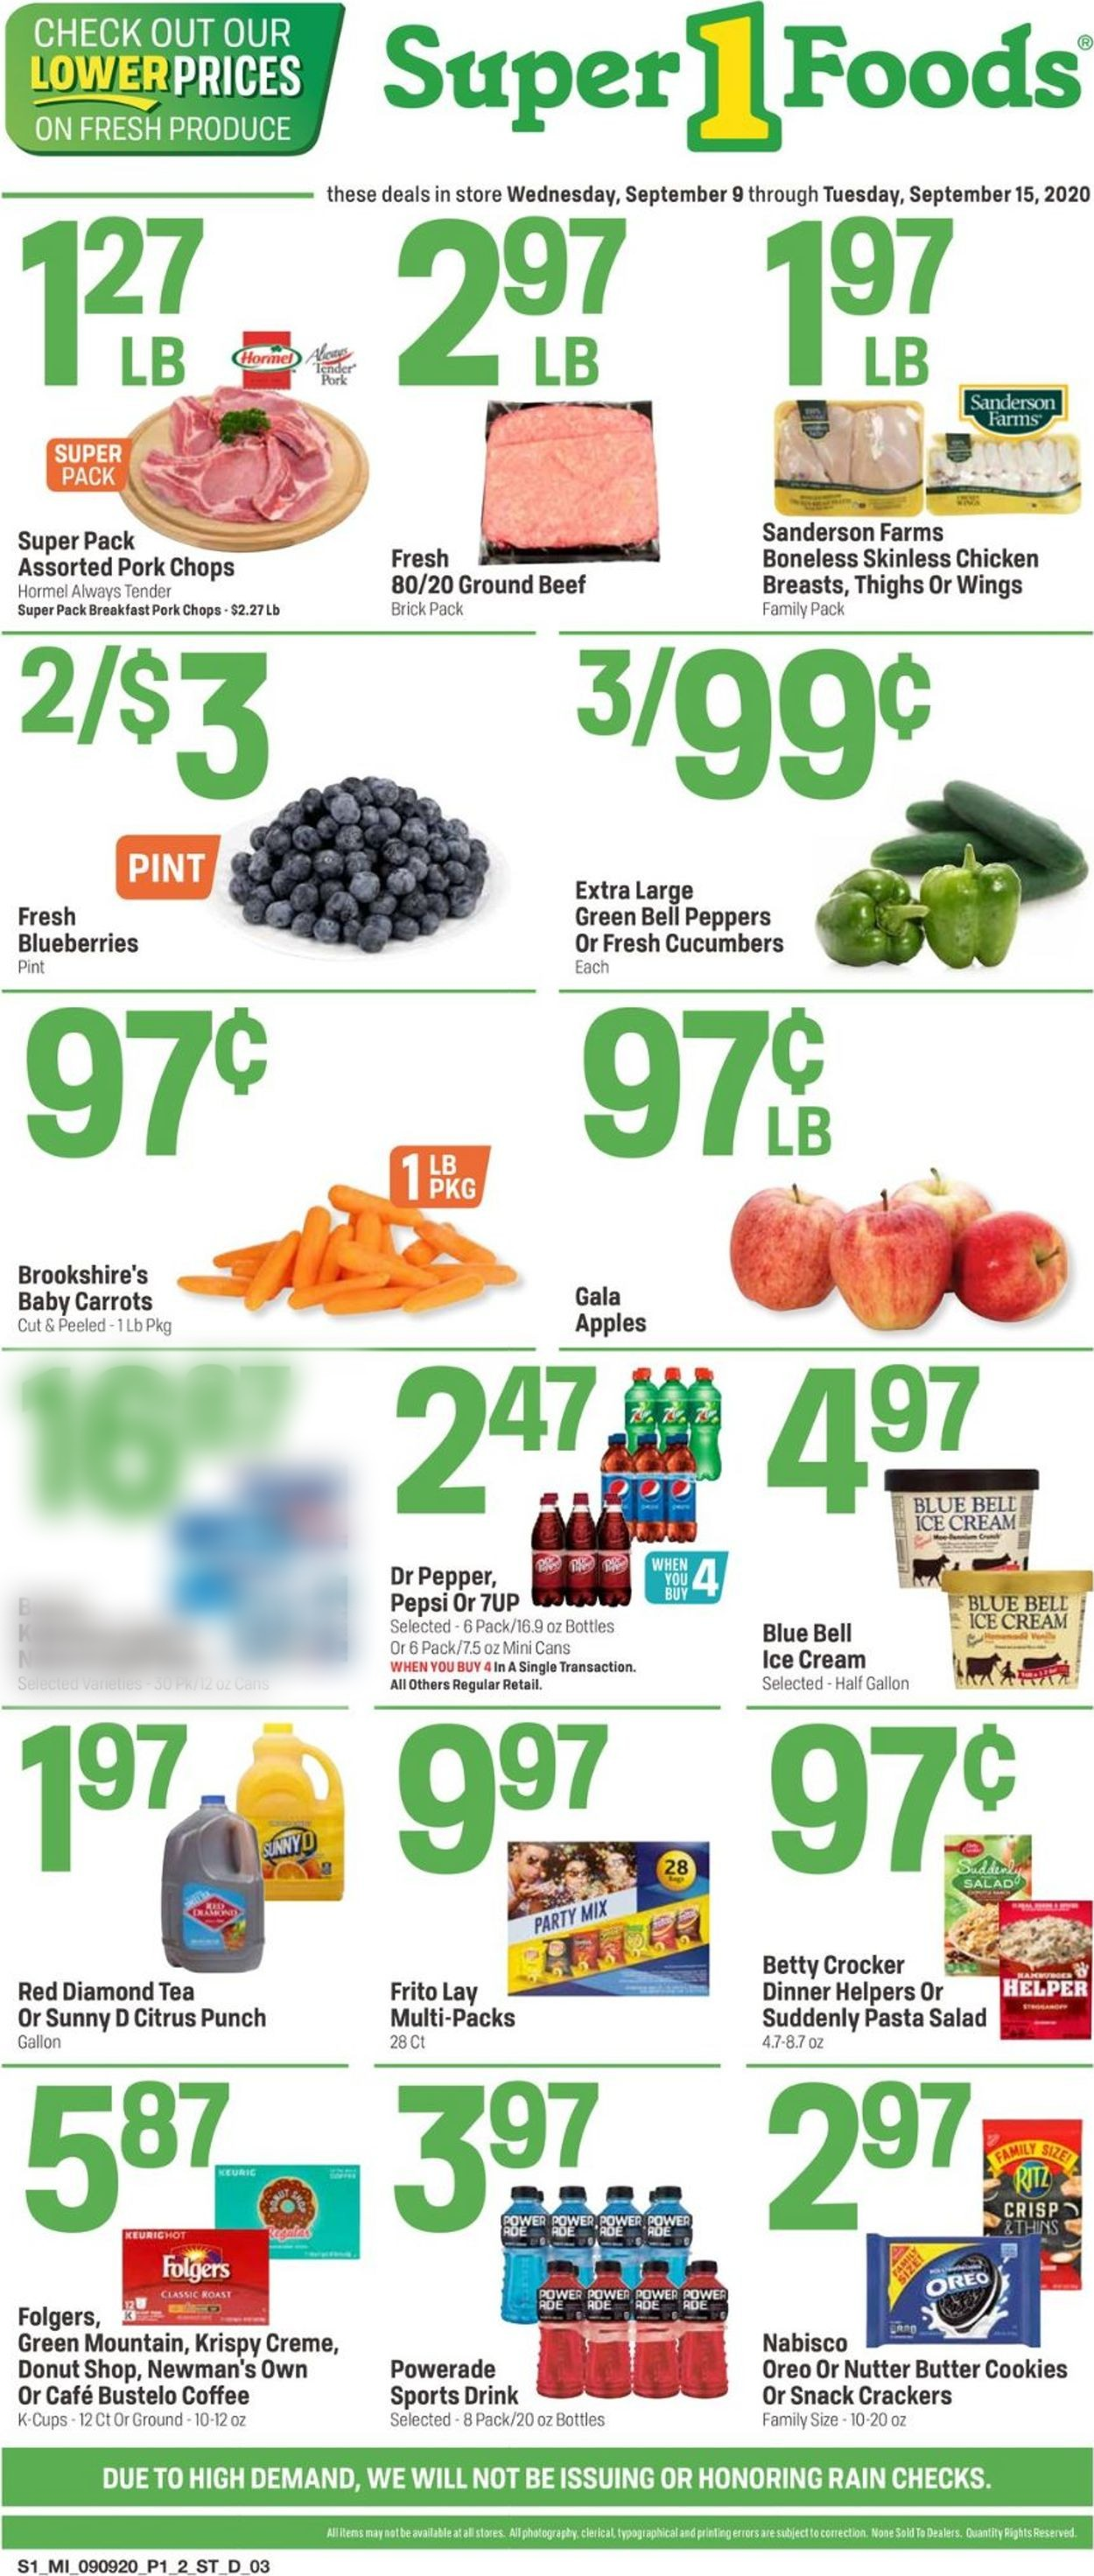 Super 1 Foods Weekly Ad Circular - valid 09/09-09/15/2020